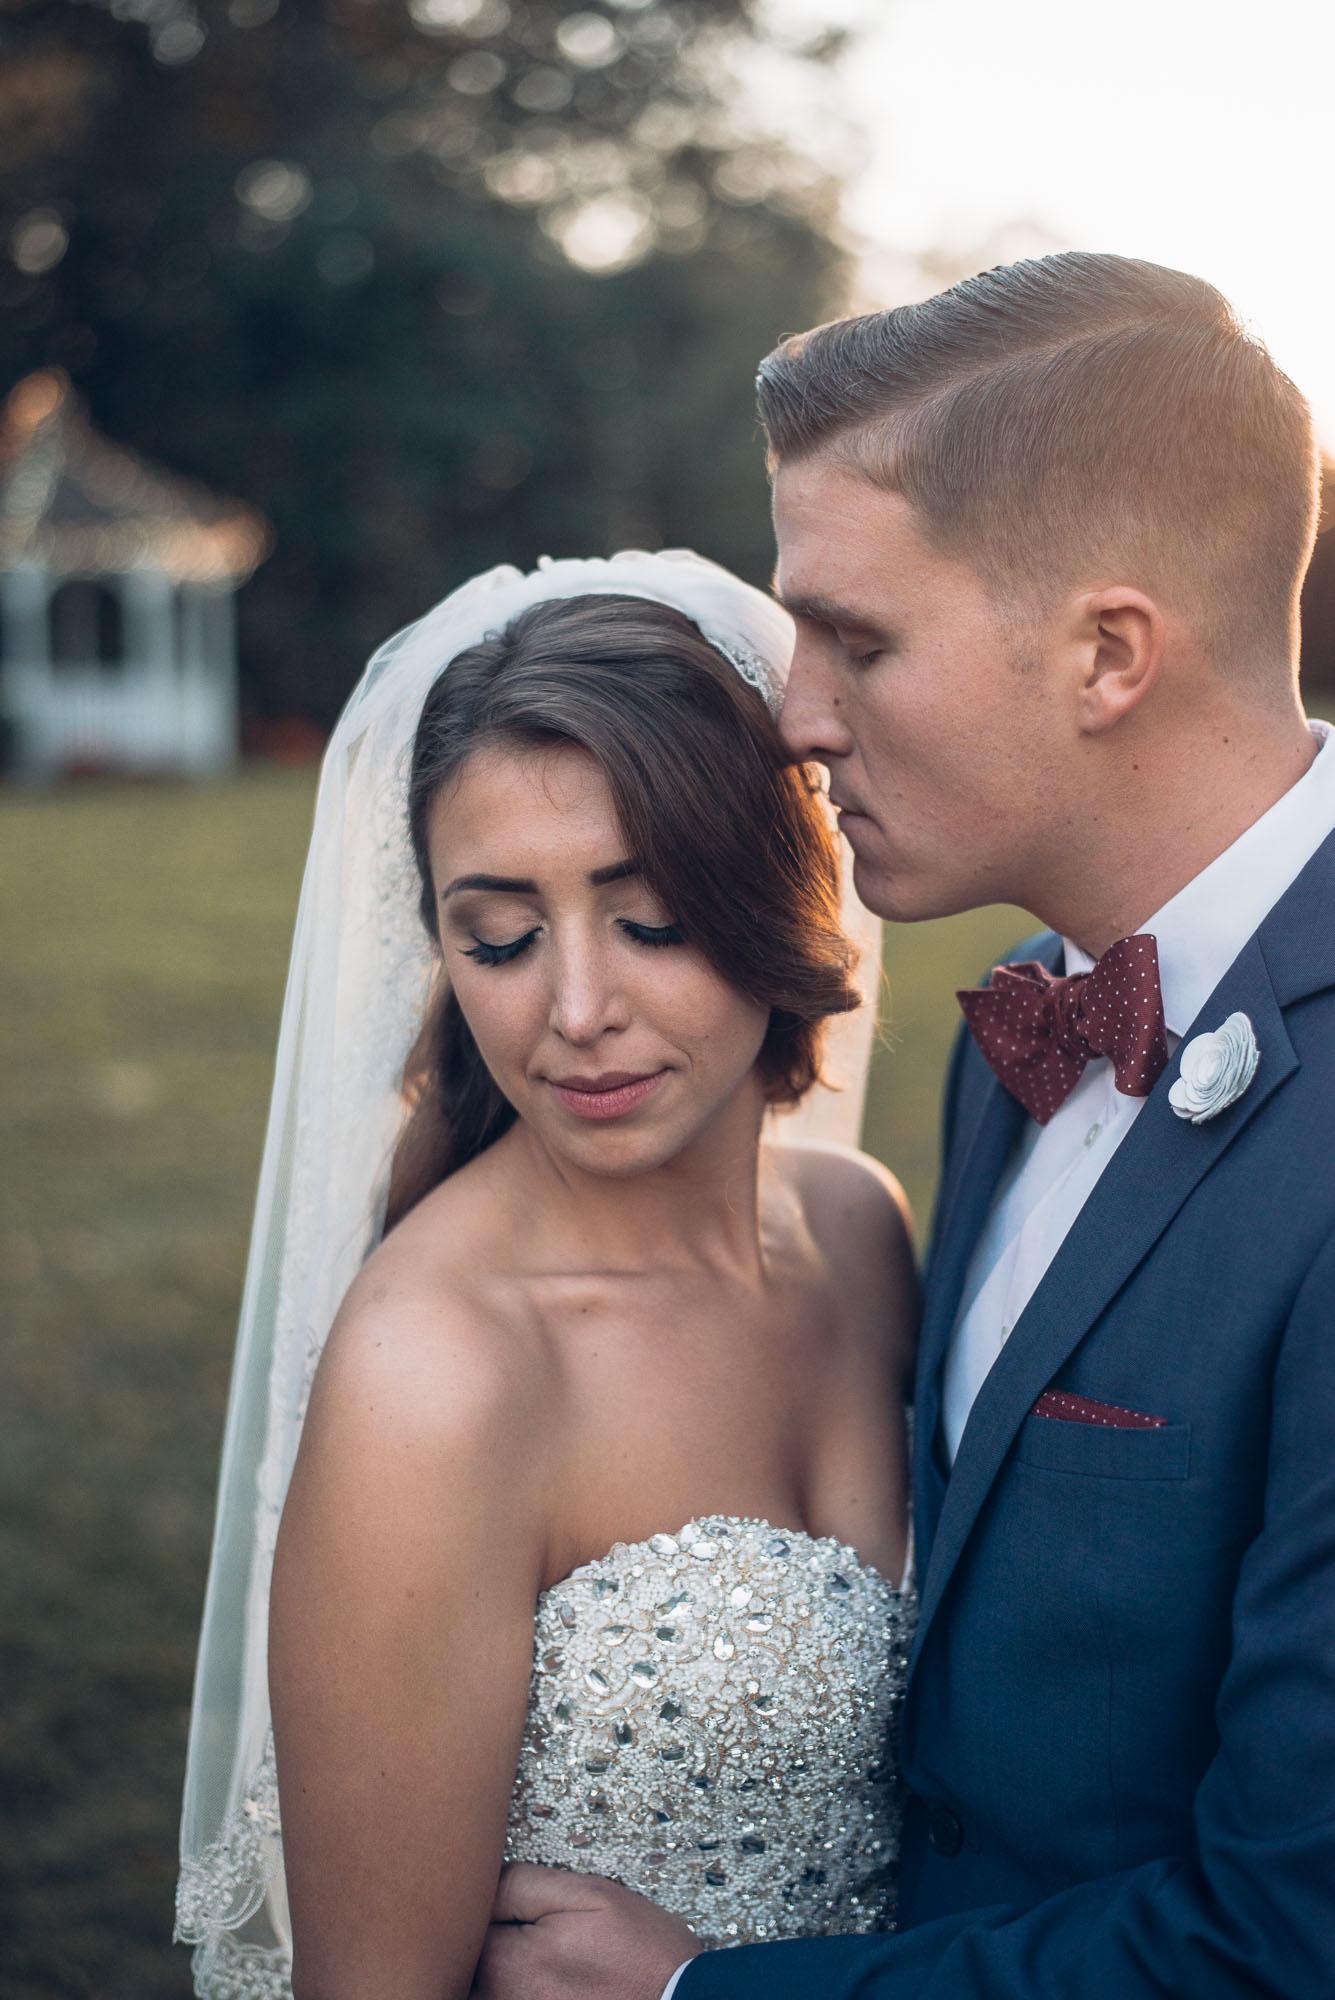 woodwinds_wedding_171020_web-38.jpg